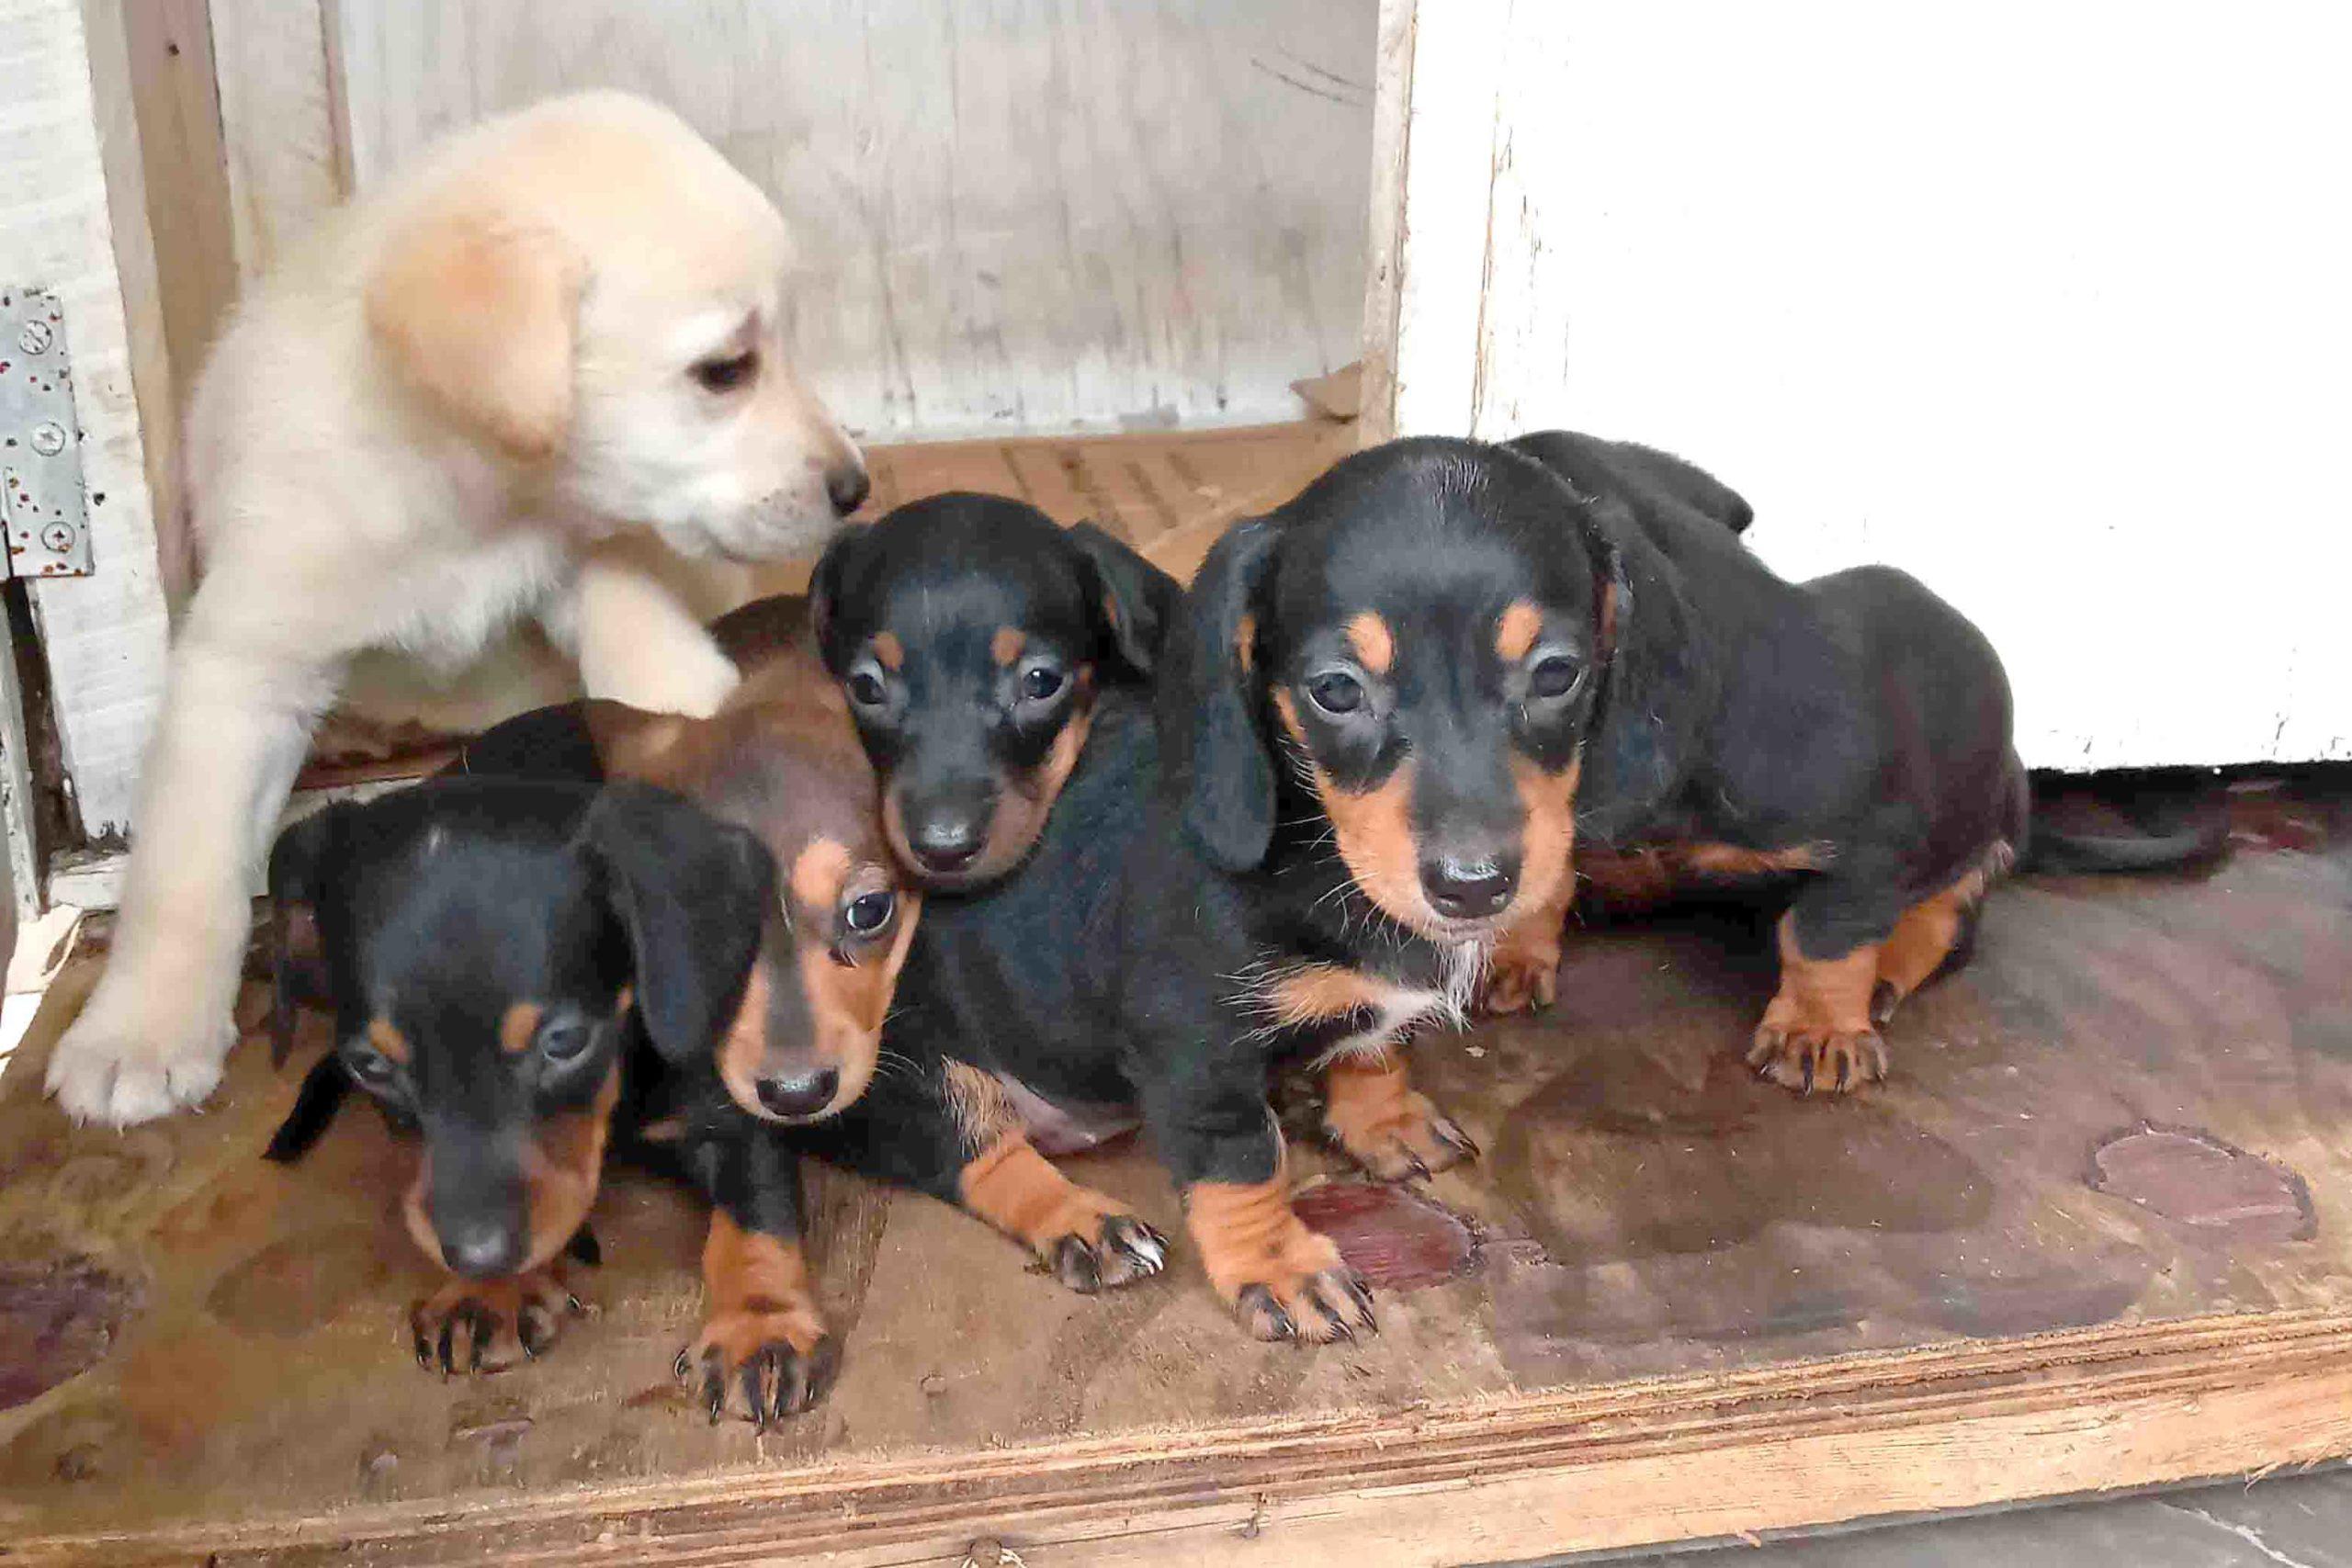 Labrador And Dachshund Puppy For Sale Sri Lanka Ikman Classified Ad